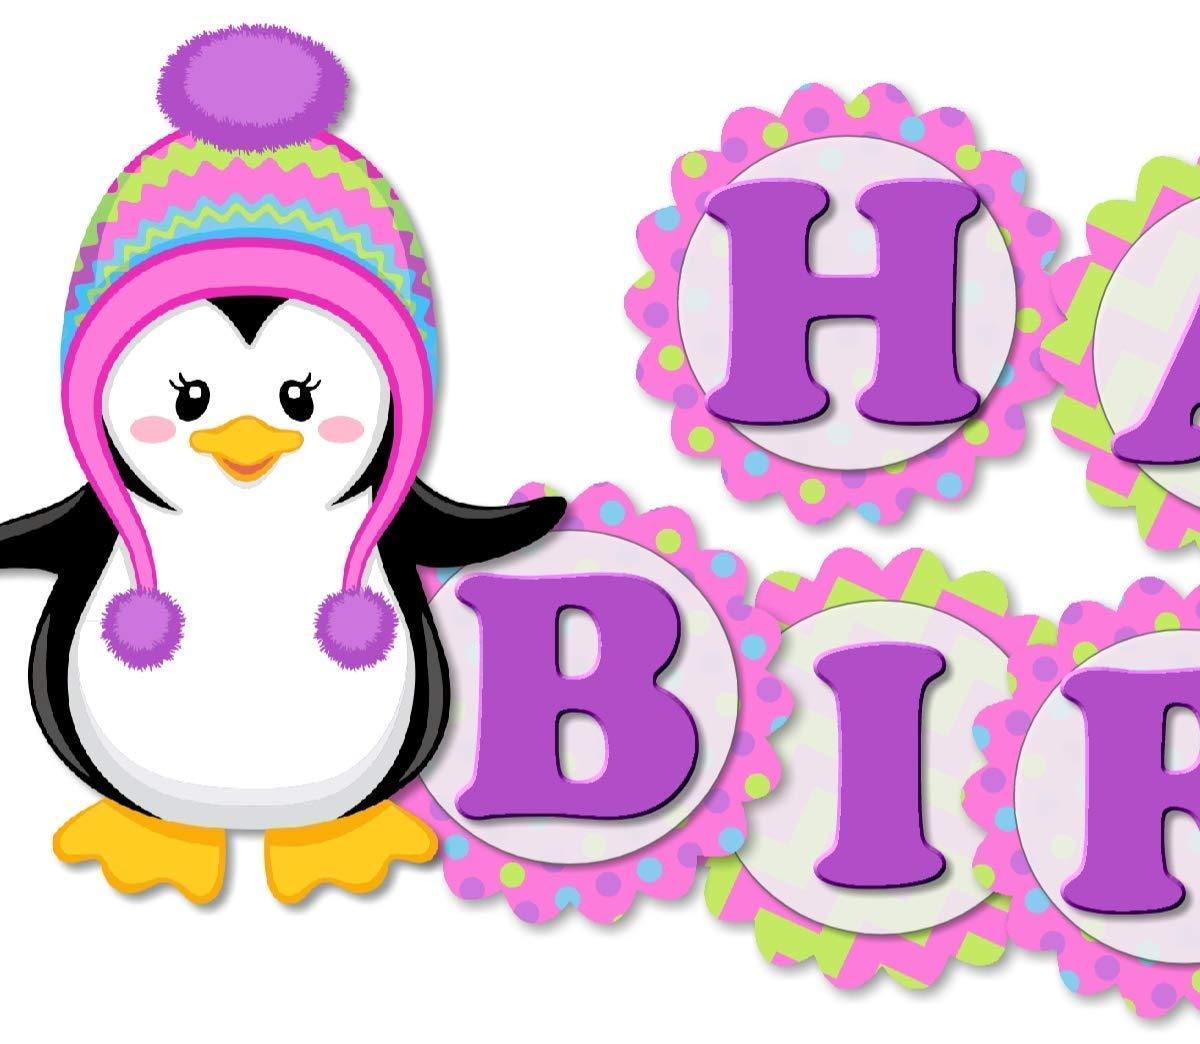 Girl Penguin Party Supplies Penguin Party Decorations Penguin Banner Penguin Cake Topper Penguin Birthday Decorations